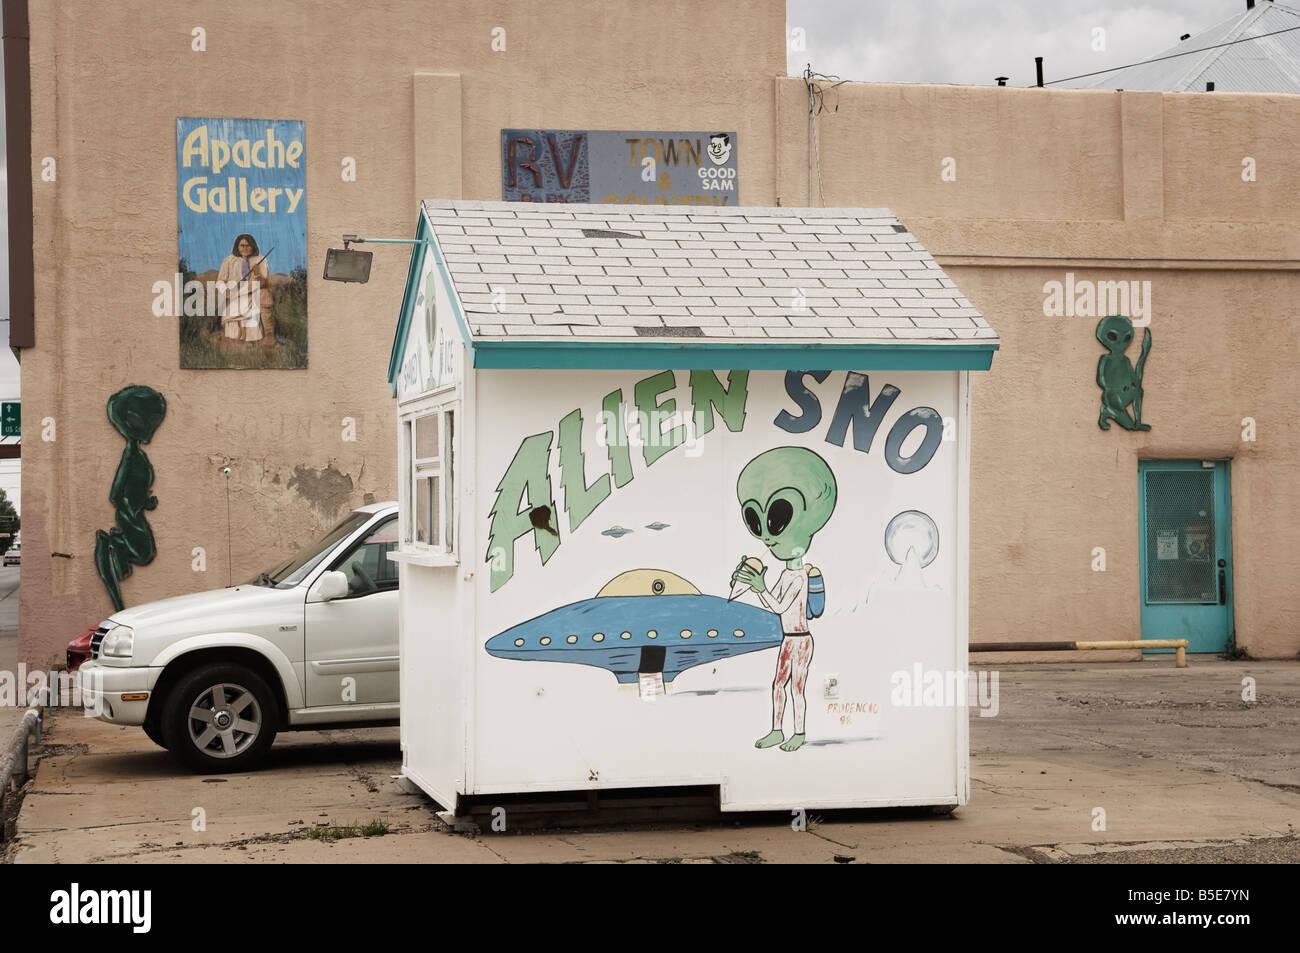 alien sno shaved ice outlet hut car park - Stock Image